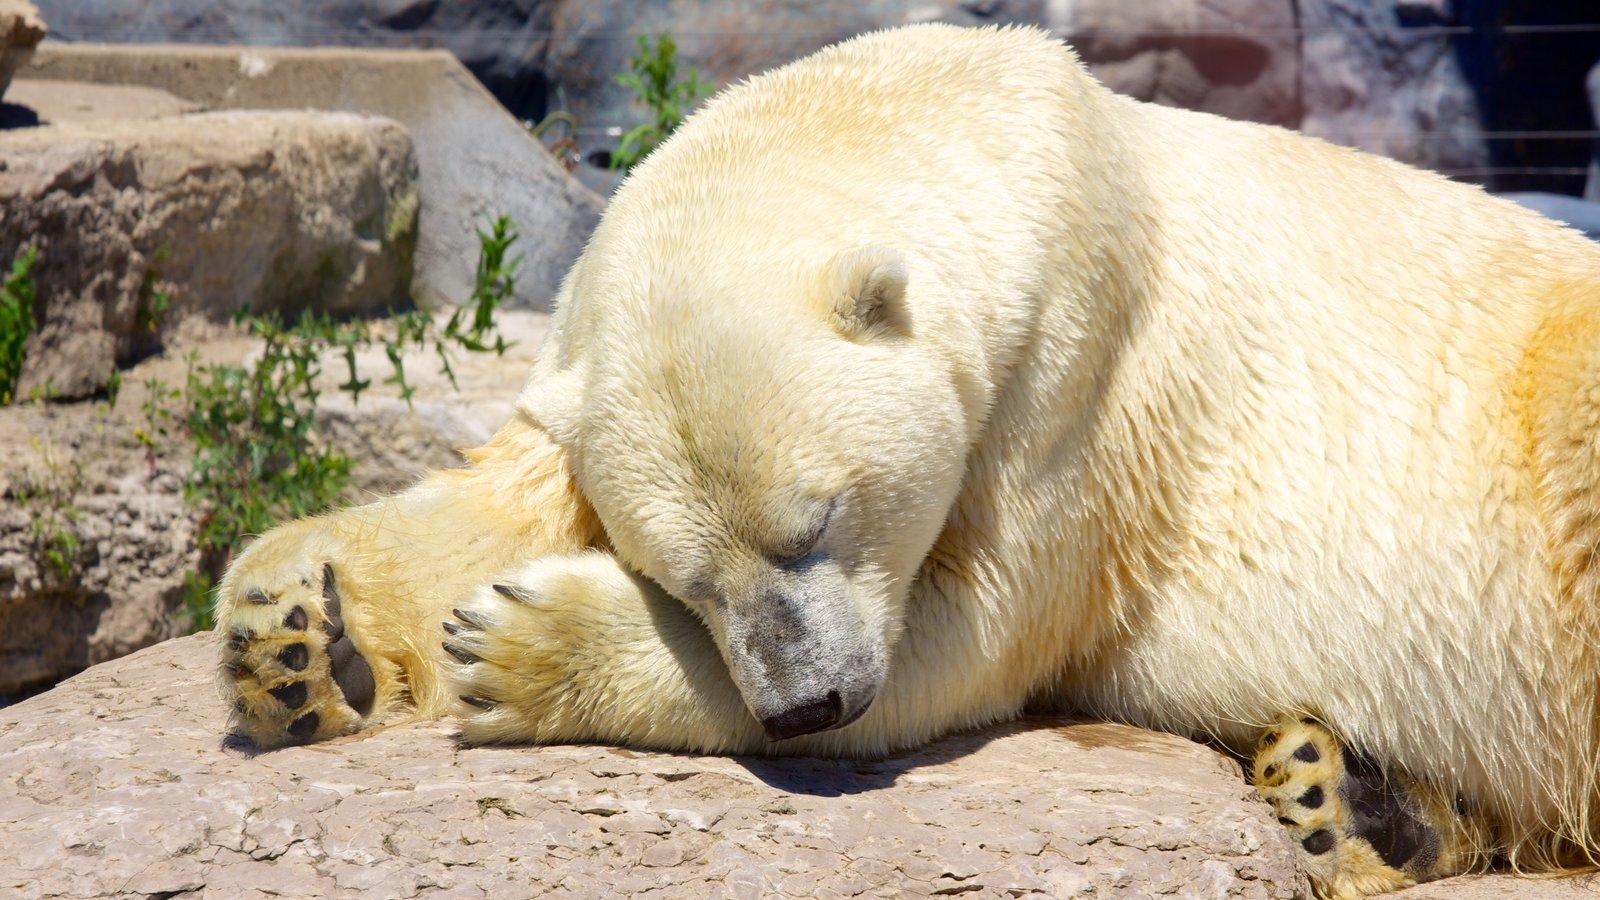 Toronto Zoo showing land animals, zoo animals and dangerous animals